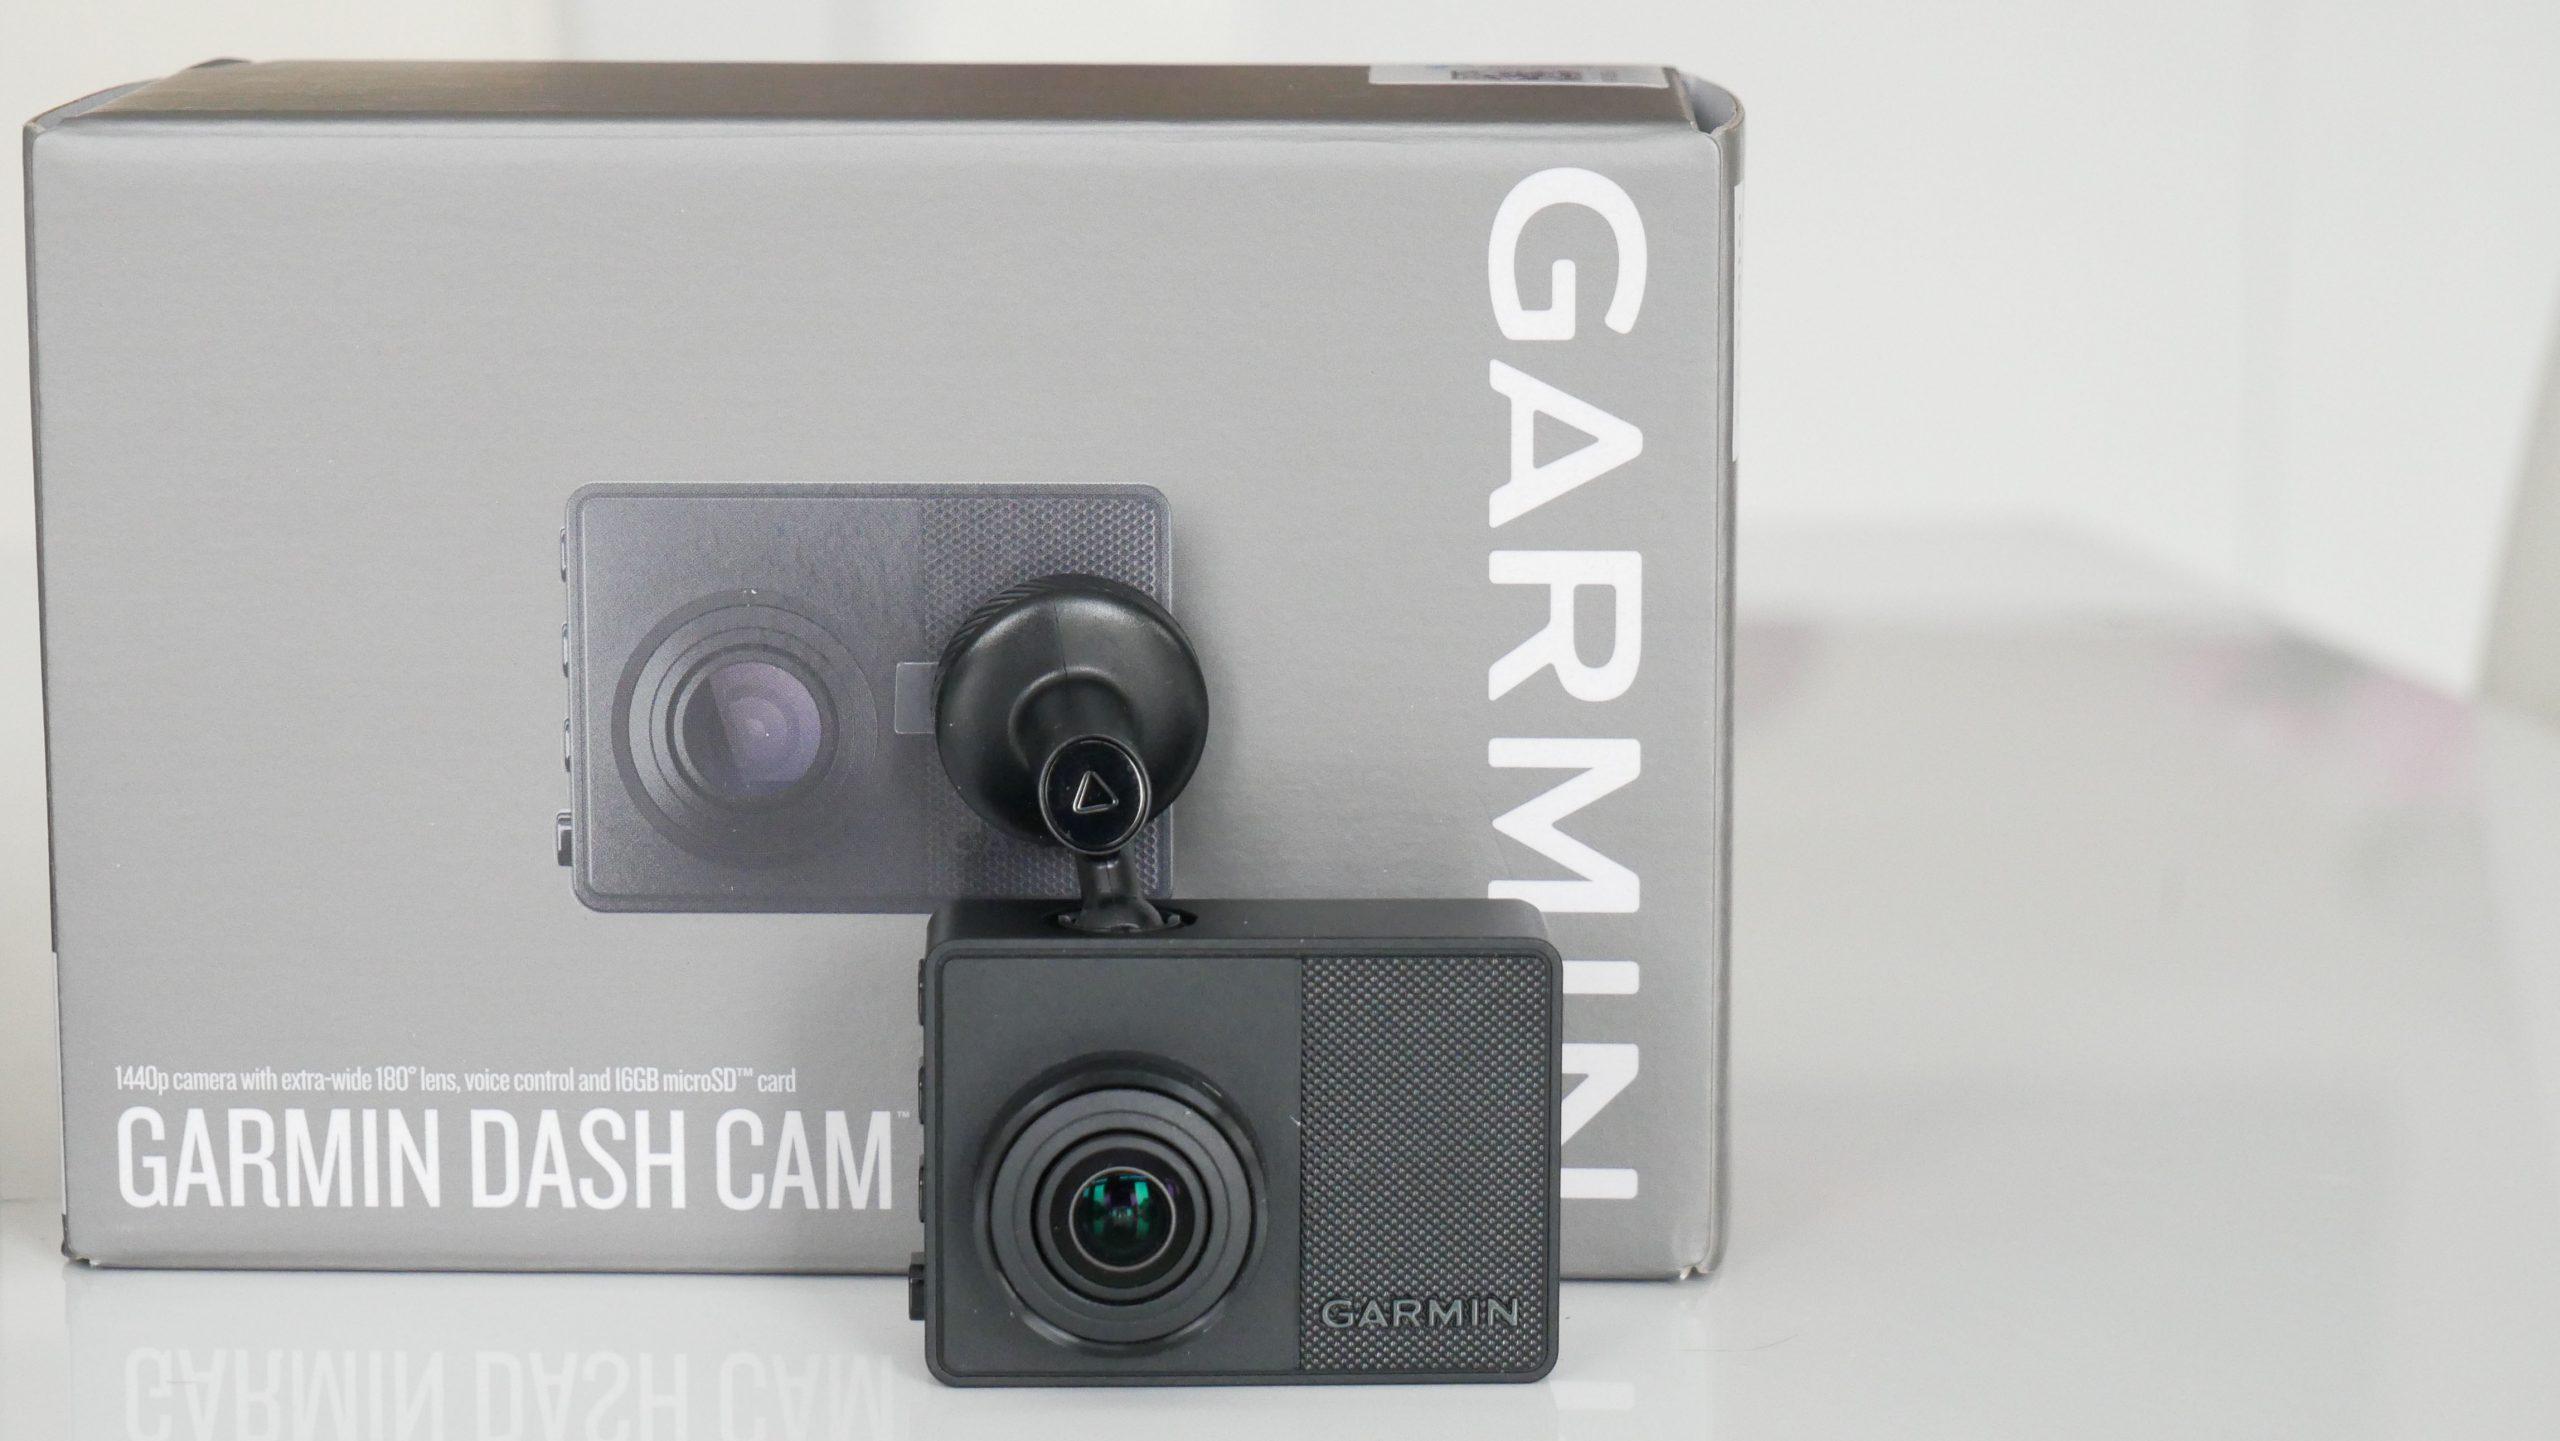 Image of 67 Dashcam from Garmin